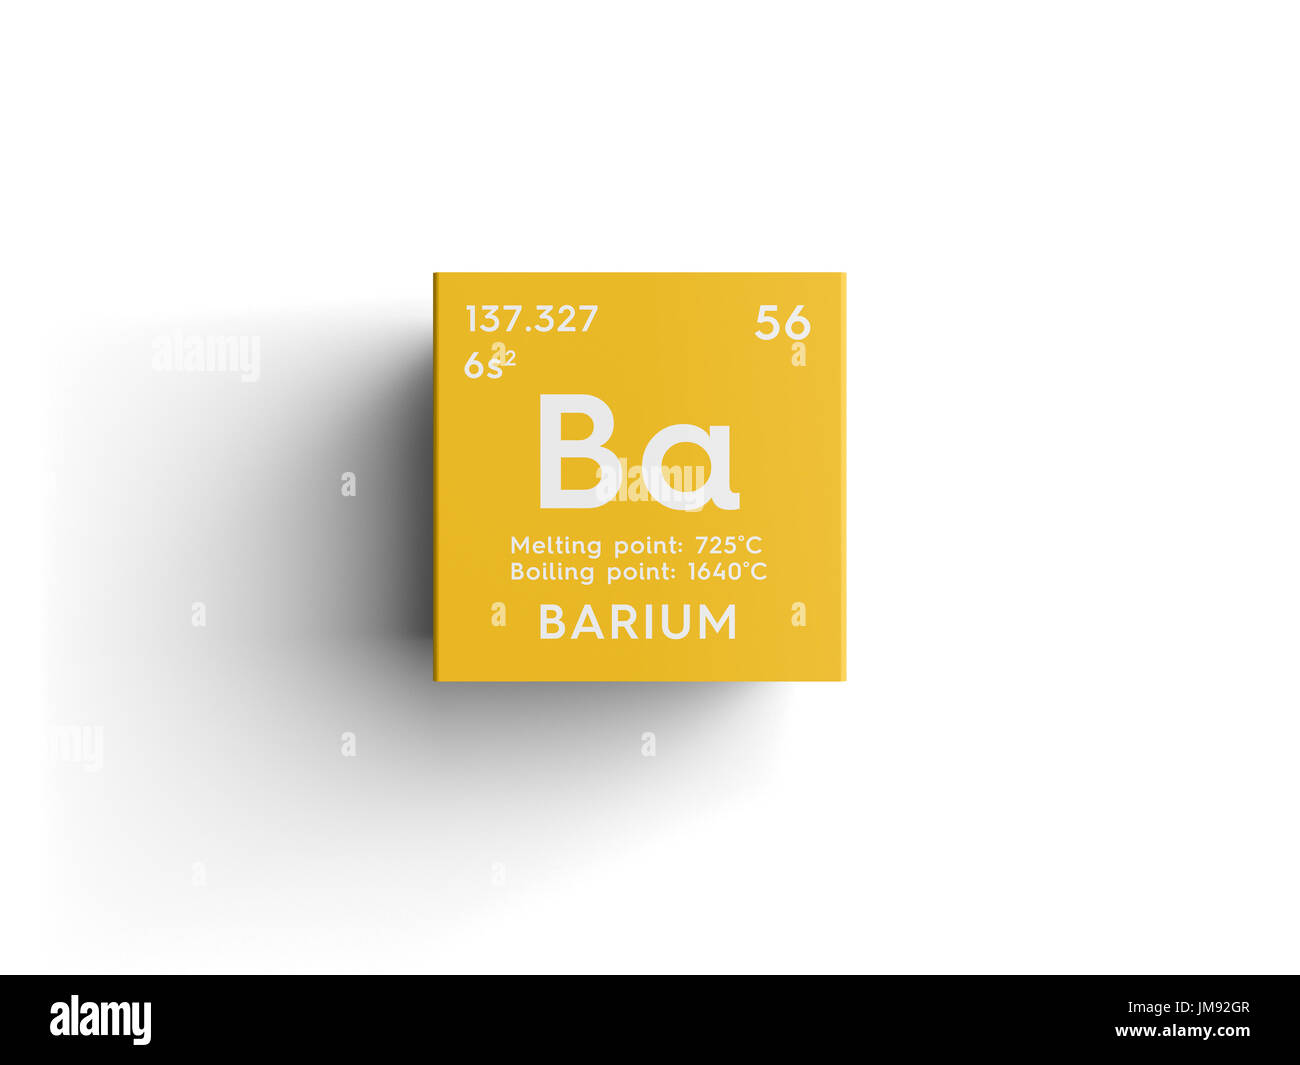 Barium Alkaline Earth Metals Chemical Element Of Mendeleevs Stock